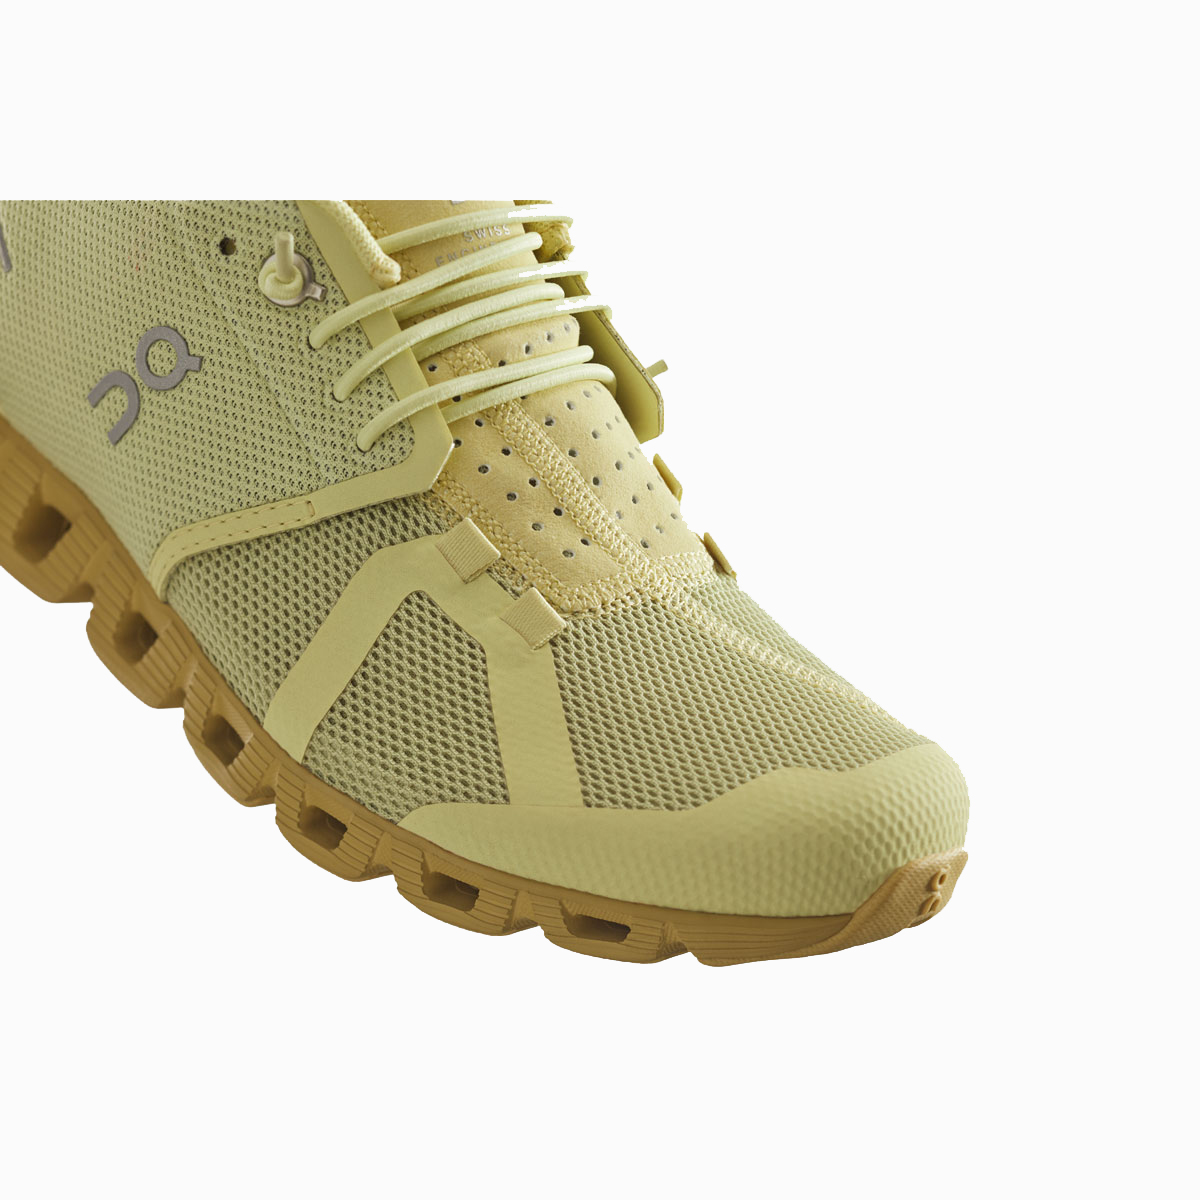 Women's On Cloud Monochrome Running Shoe - Color: Endive - Size: 5 - Width: Regular, Endive, large, image 2